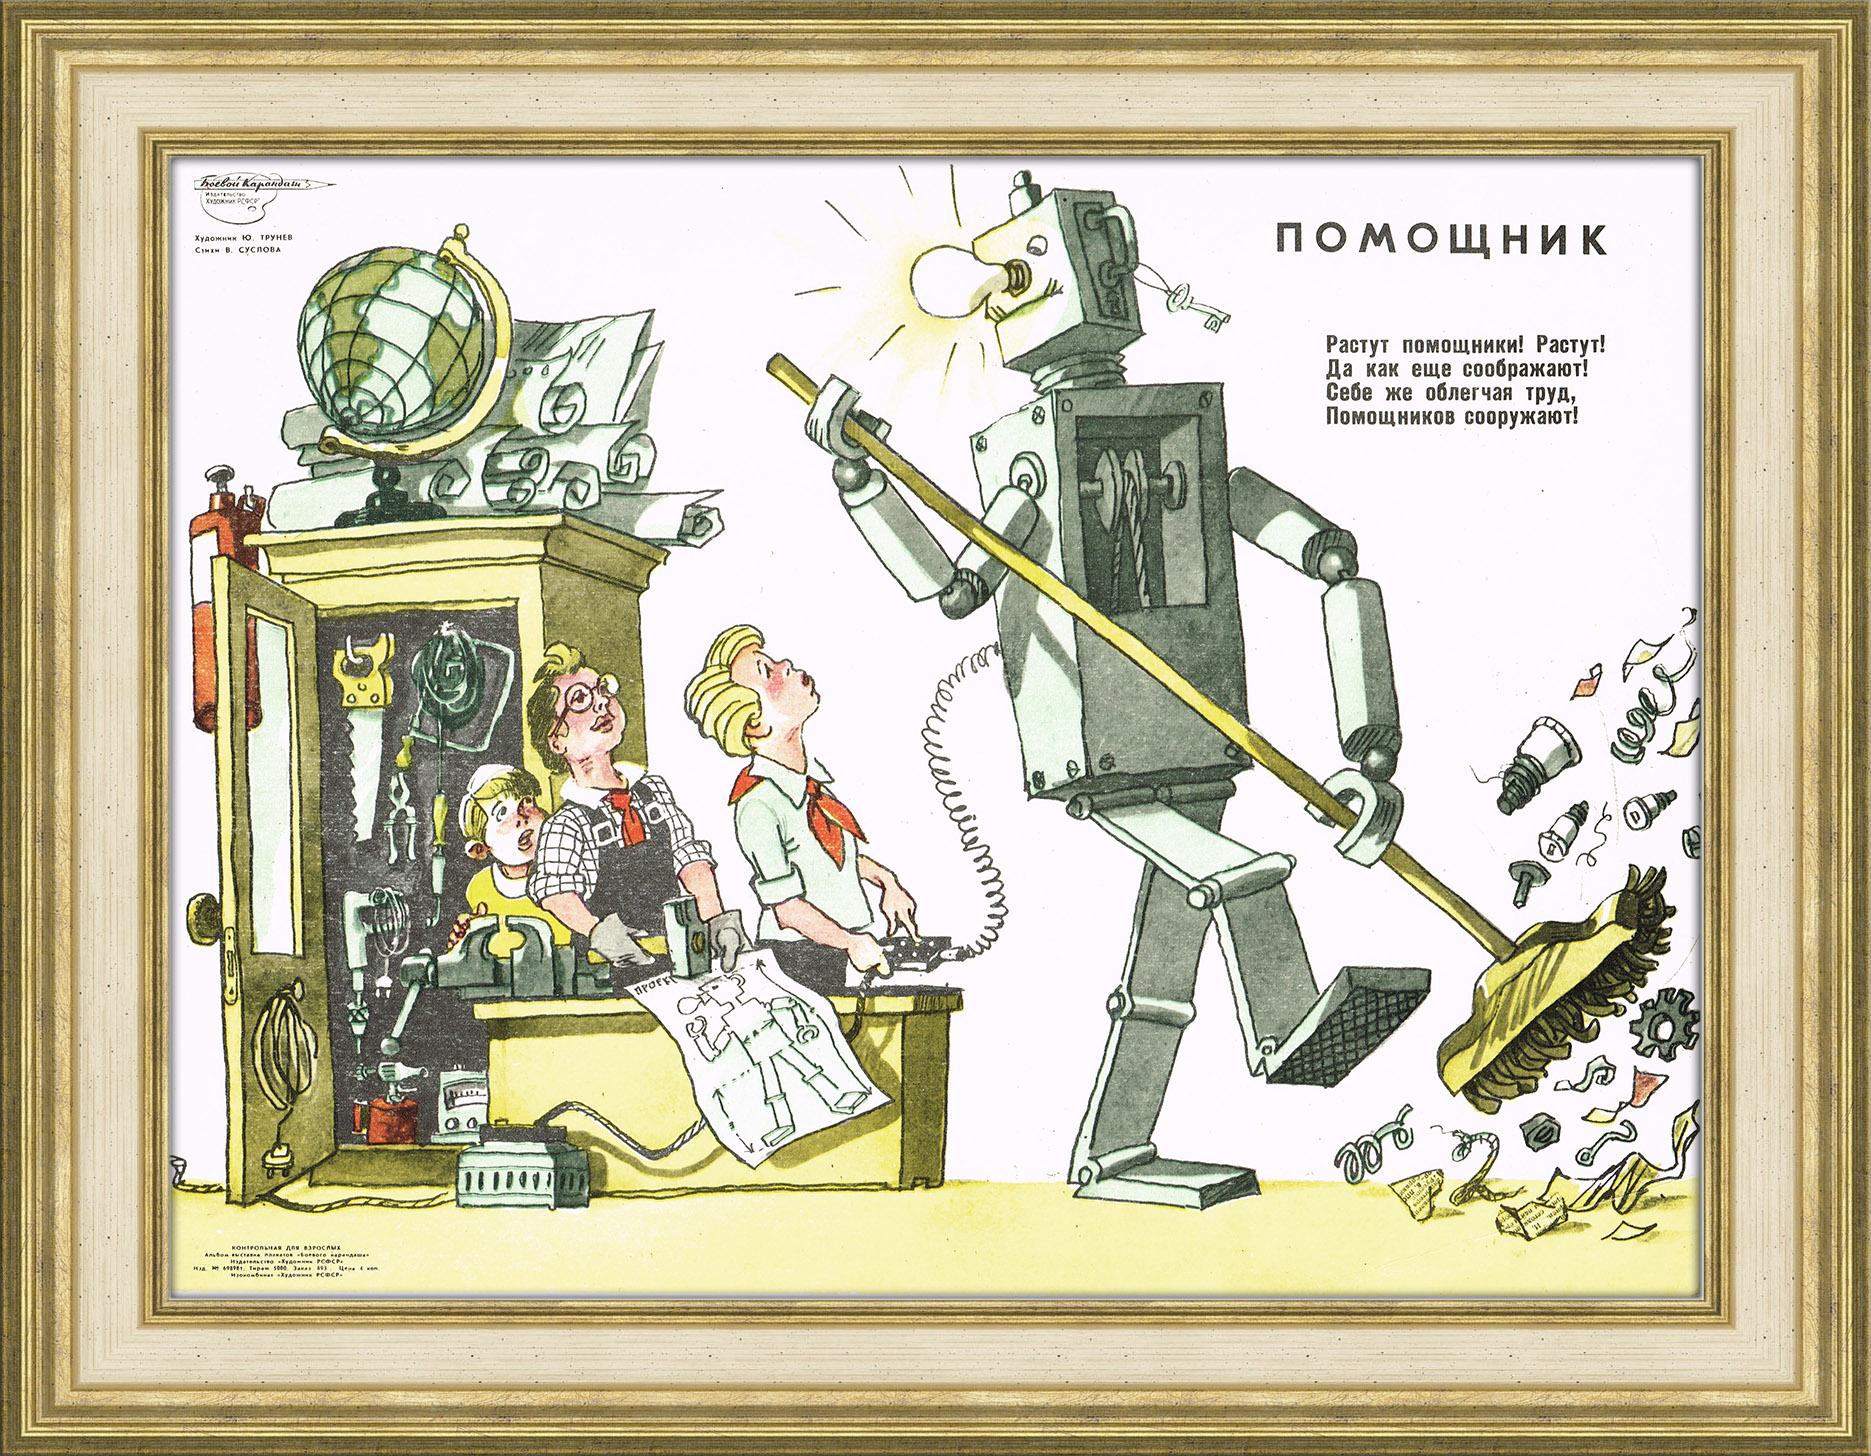 http://rarita.ru/upload/iblock/f22/pomoshchnik15052017.jpg